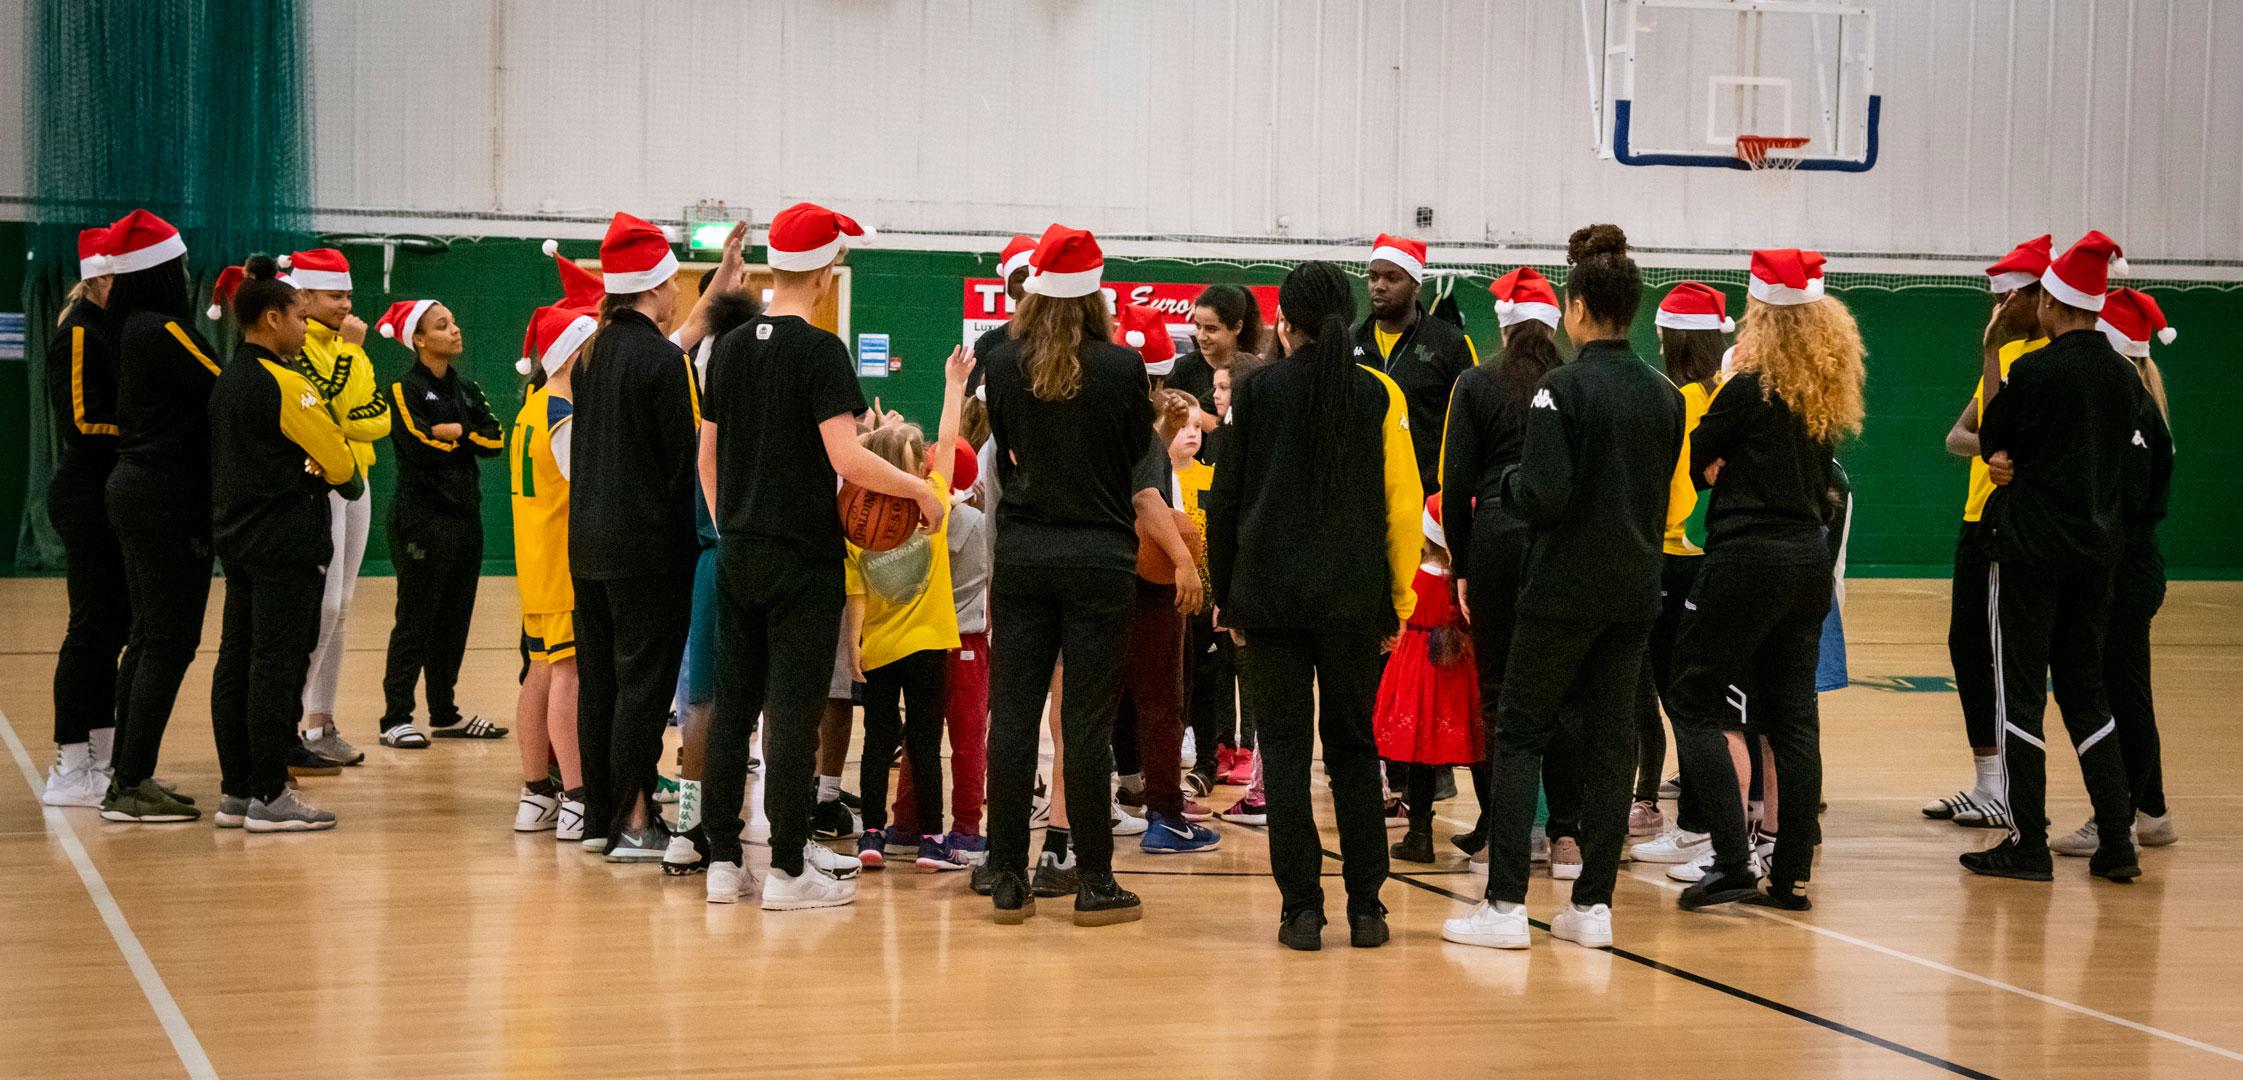 Christmas Jumper Day Sunday 23 December 2019